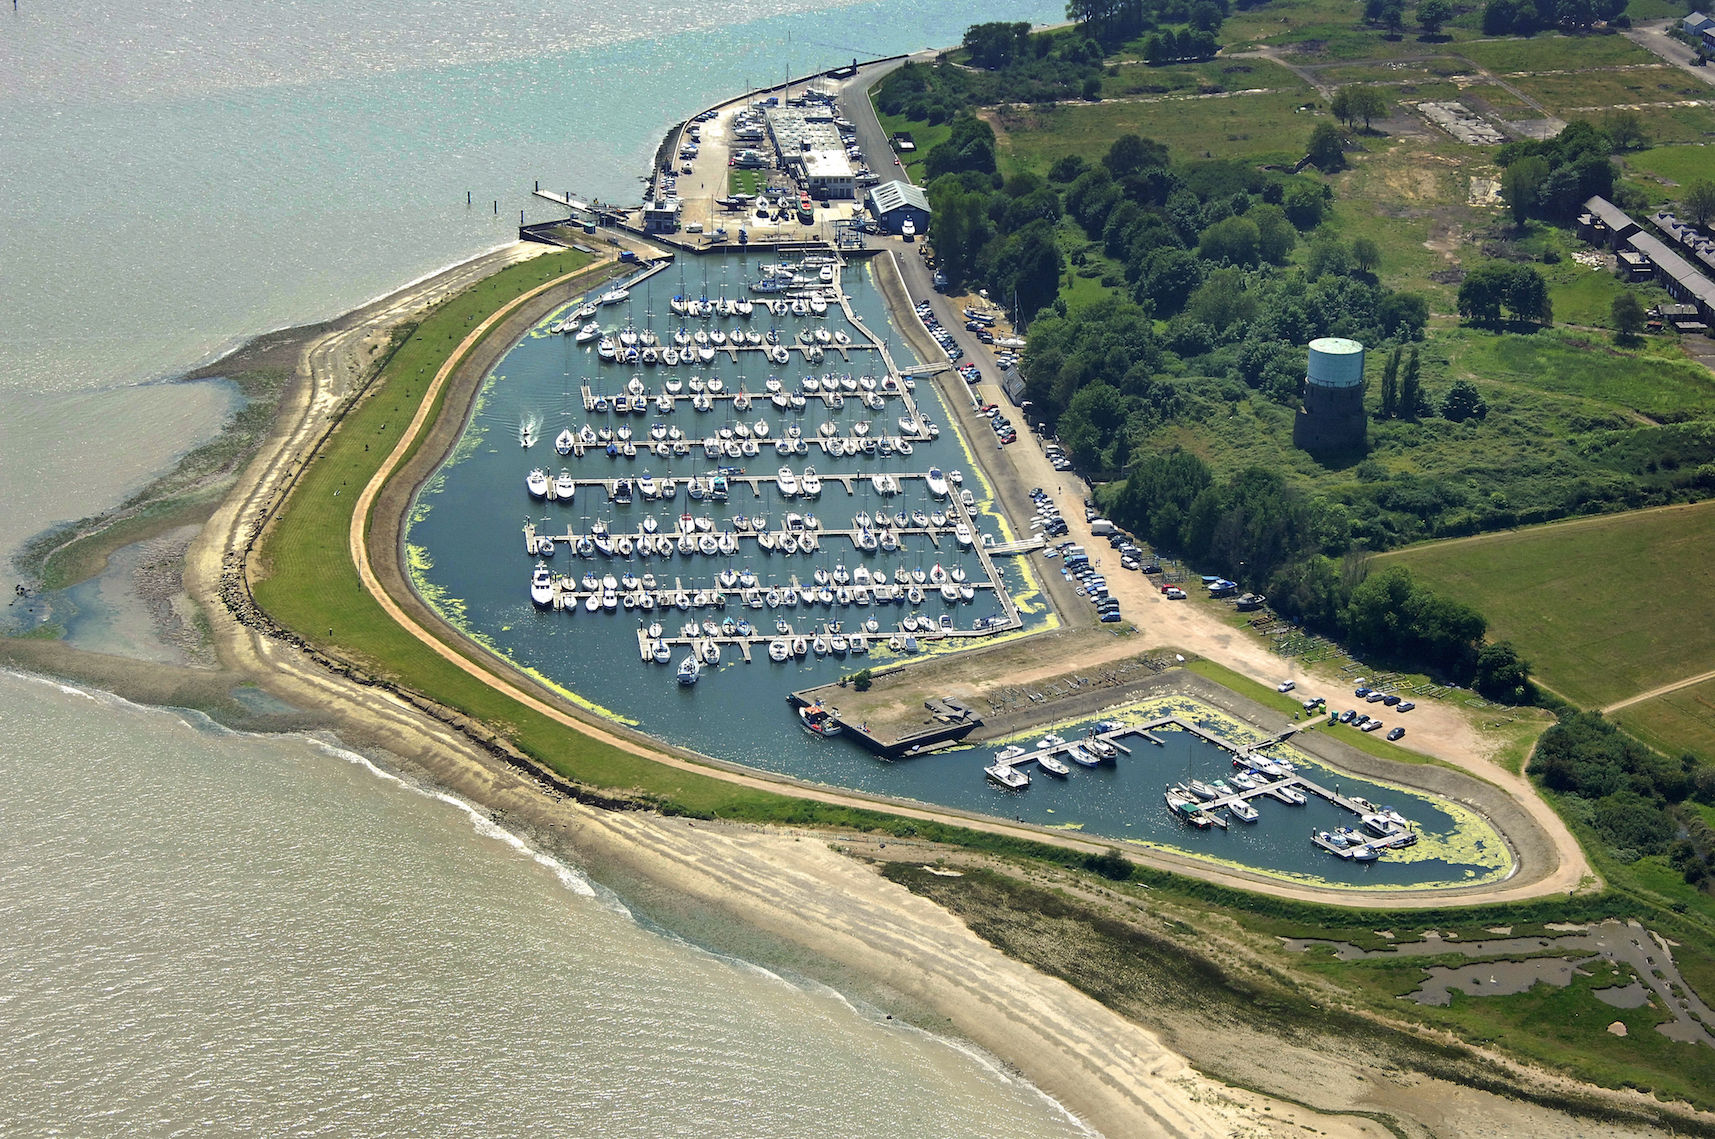 2021 - FOA East Coast Rally - Shotley Marina